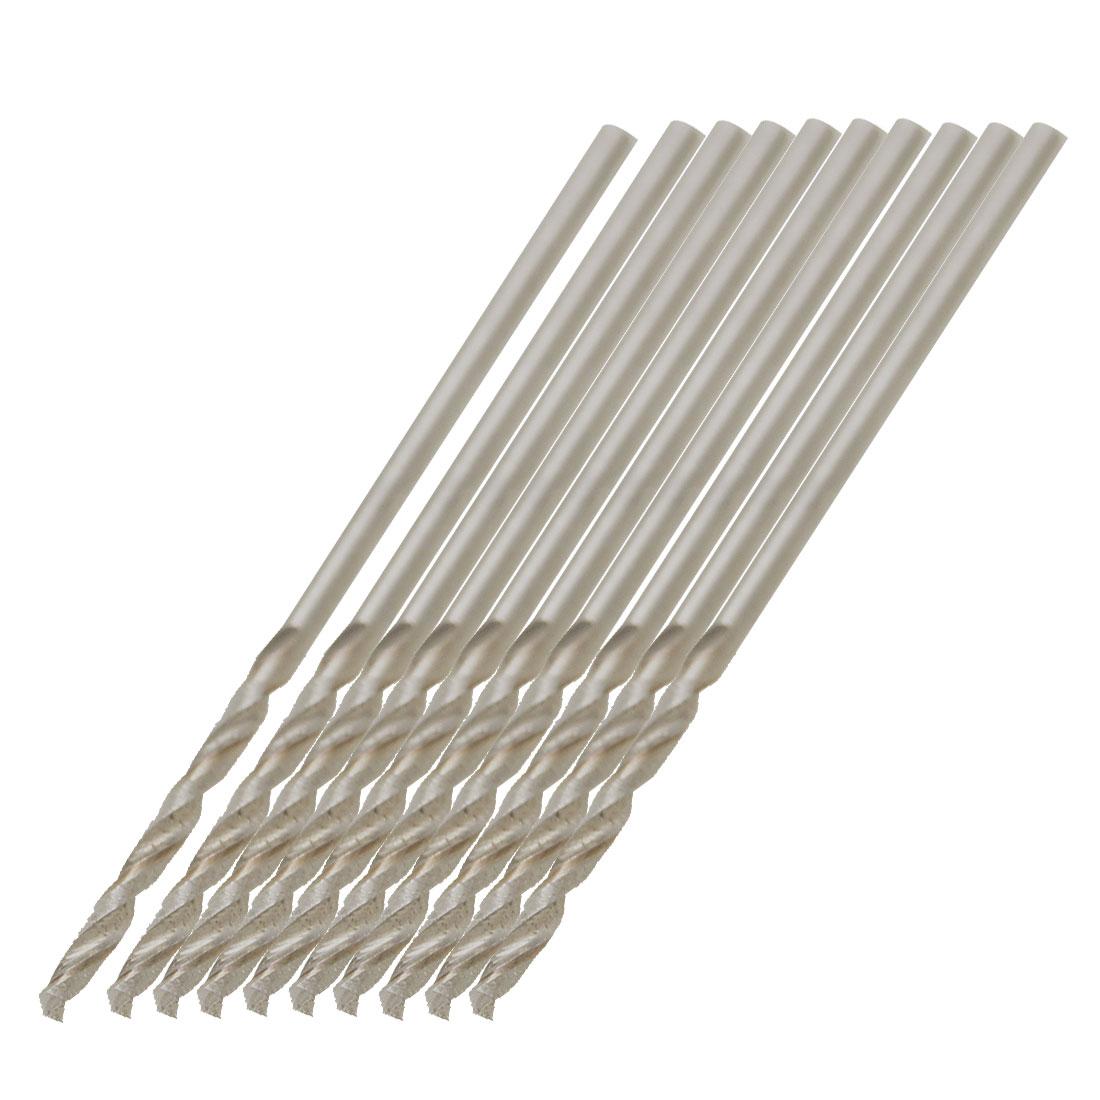 10 Pcs Split Point Straight Shank High Speed Steel Fully Ground Twist Drill Bits 1.3mm